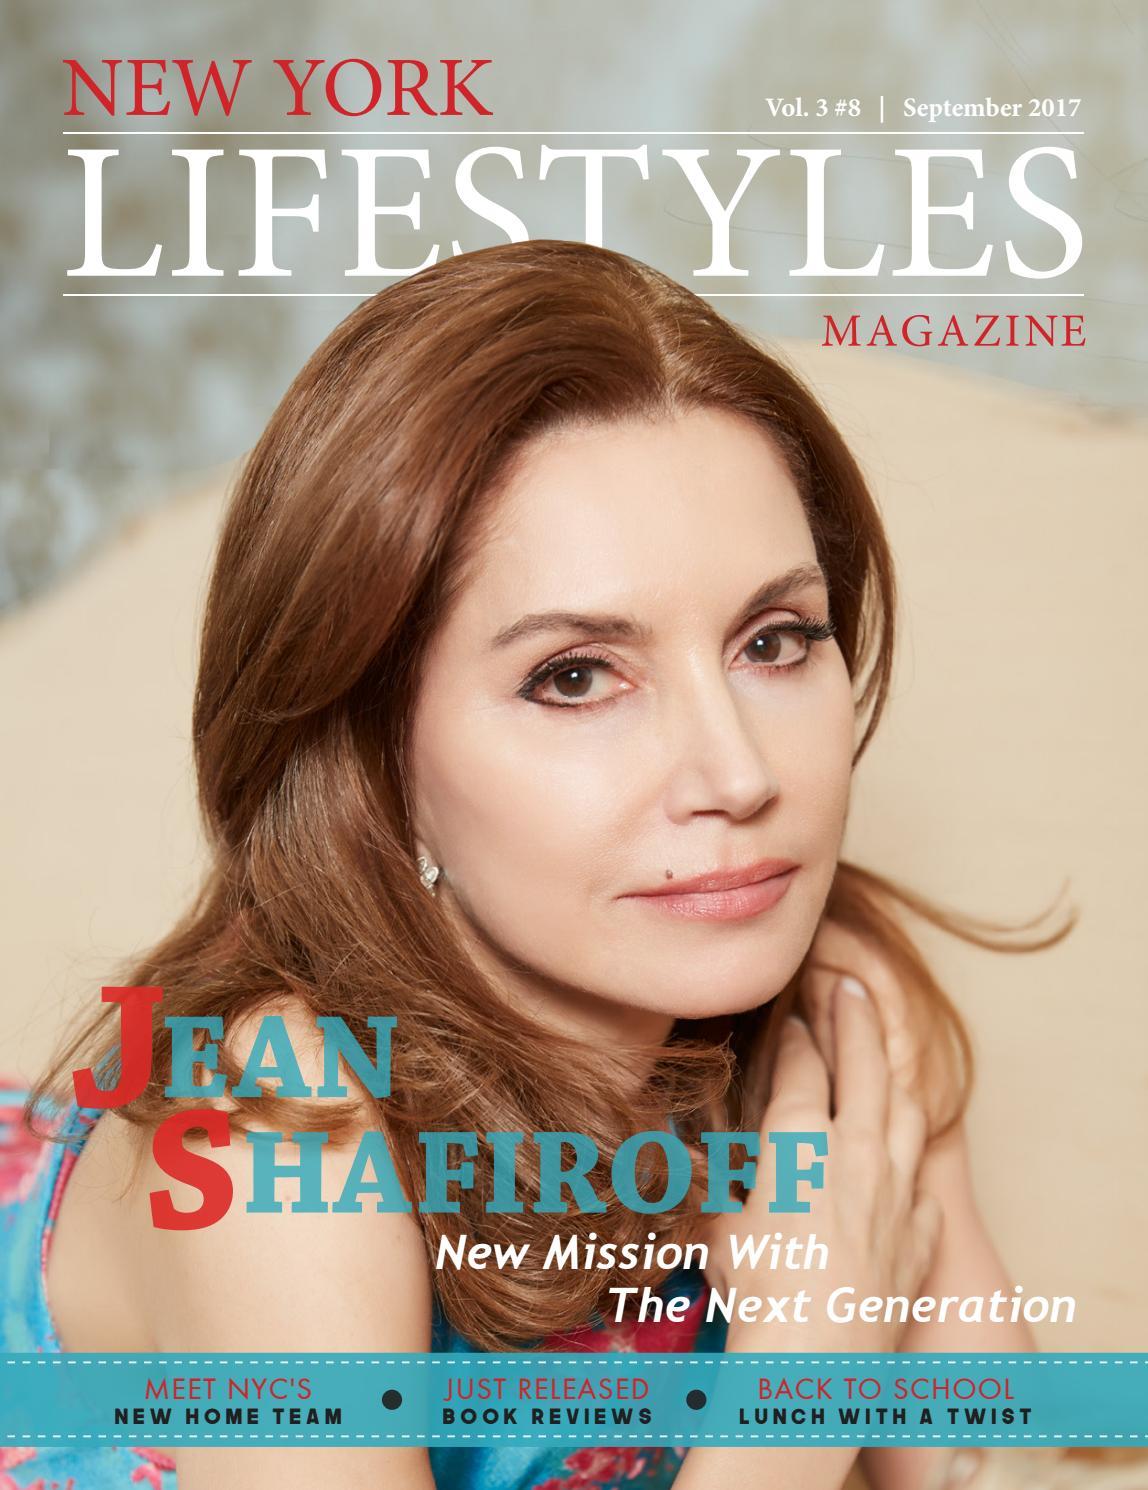 New York Lifestyles Magazine - September 2017